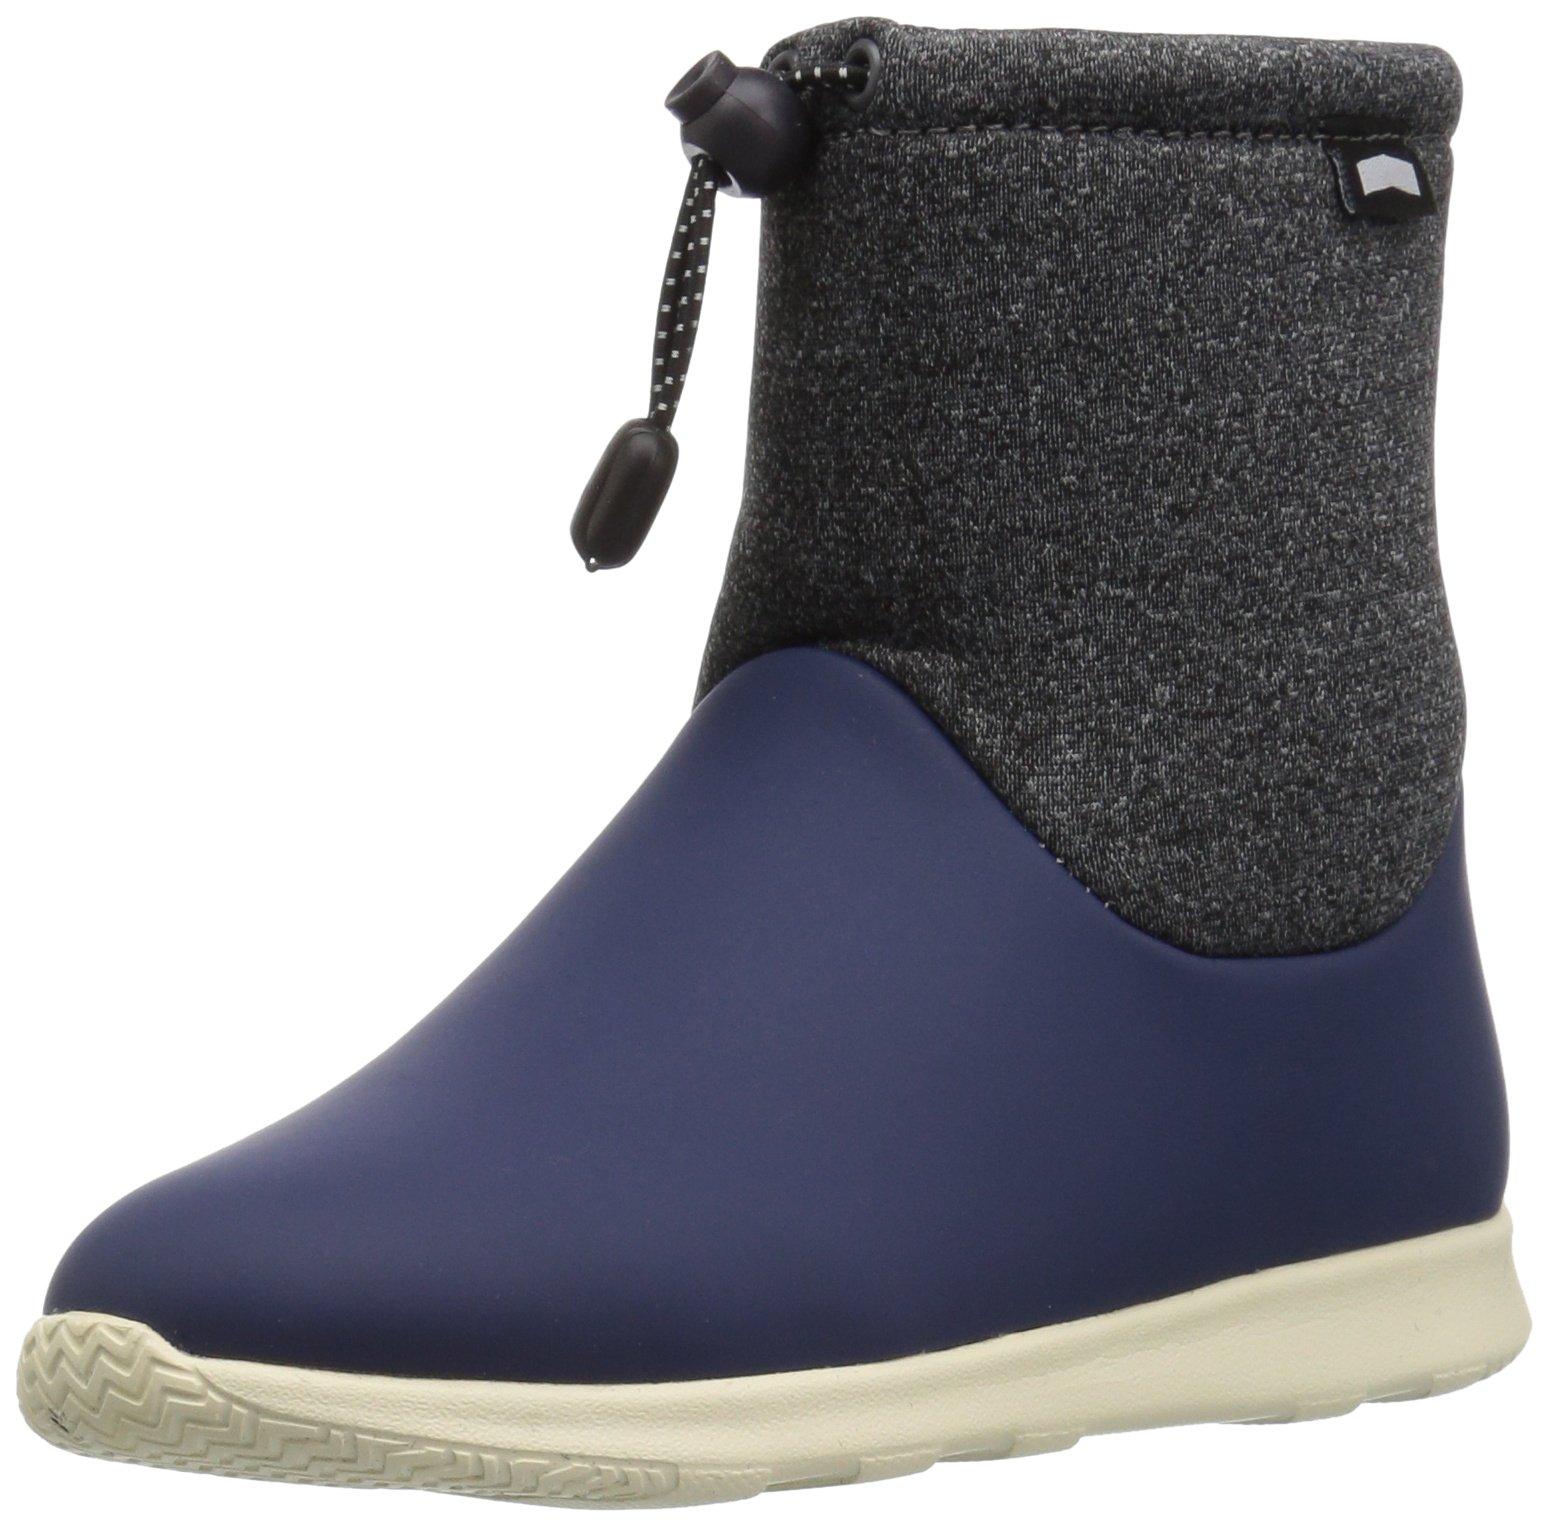 Native Shoes Unisex AP Ranger Child Rain Boot, Rgtabl/Dblgry/Bnwht, 13 M US Little Kid